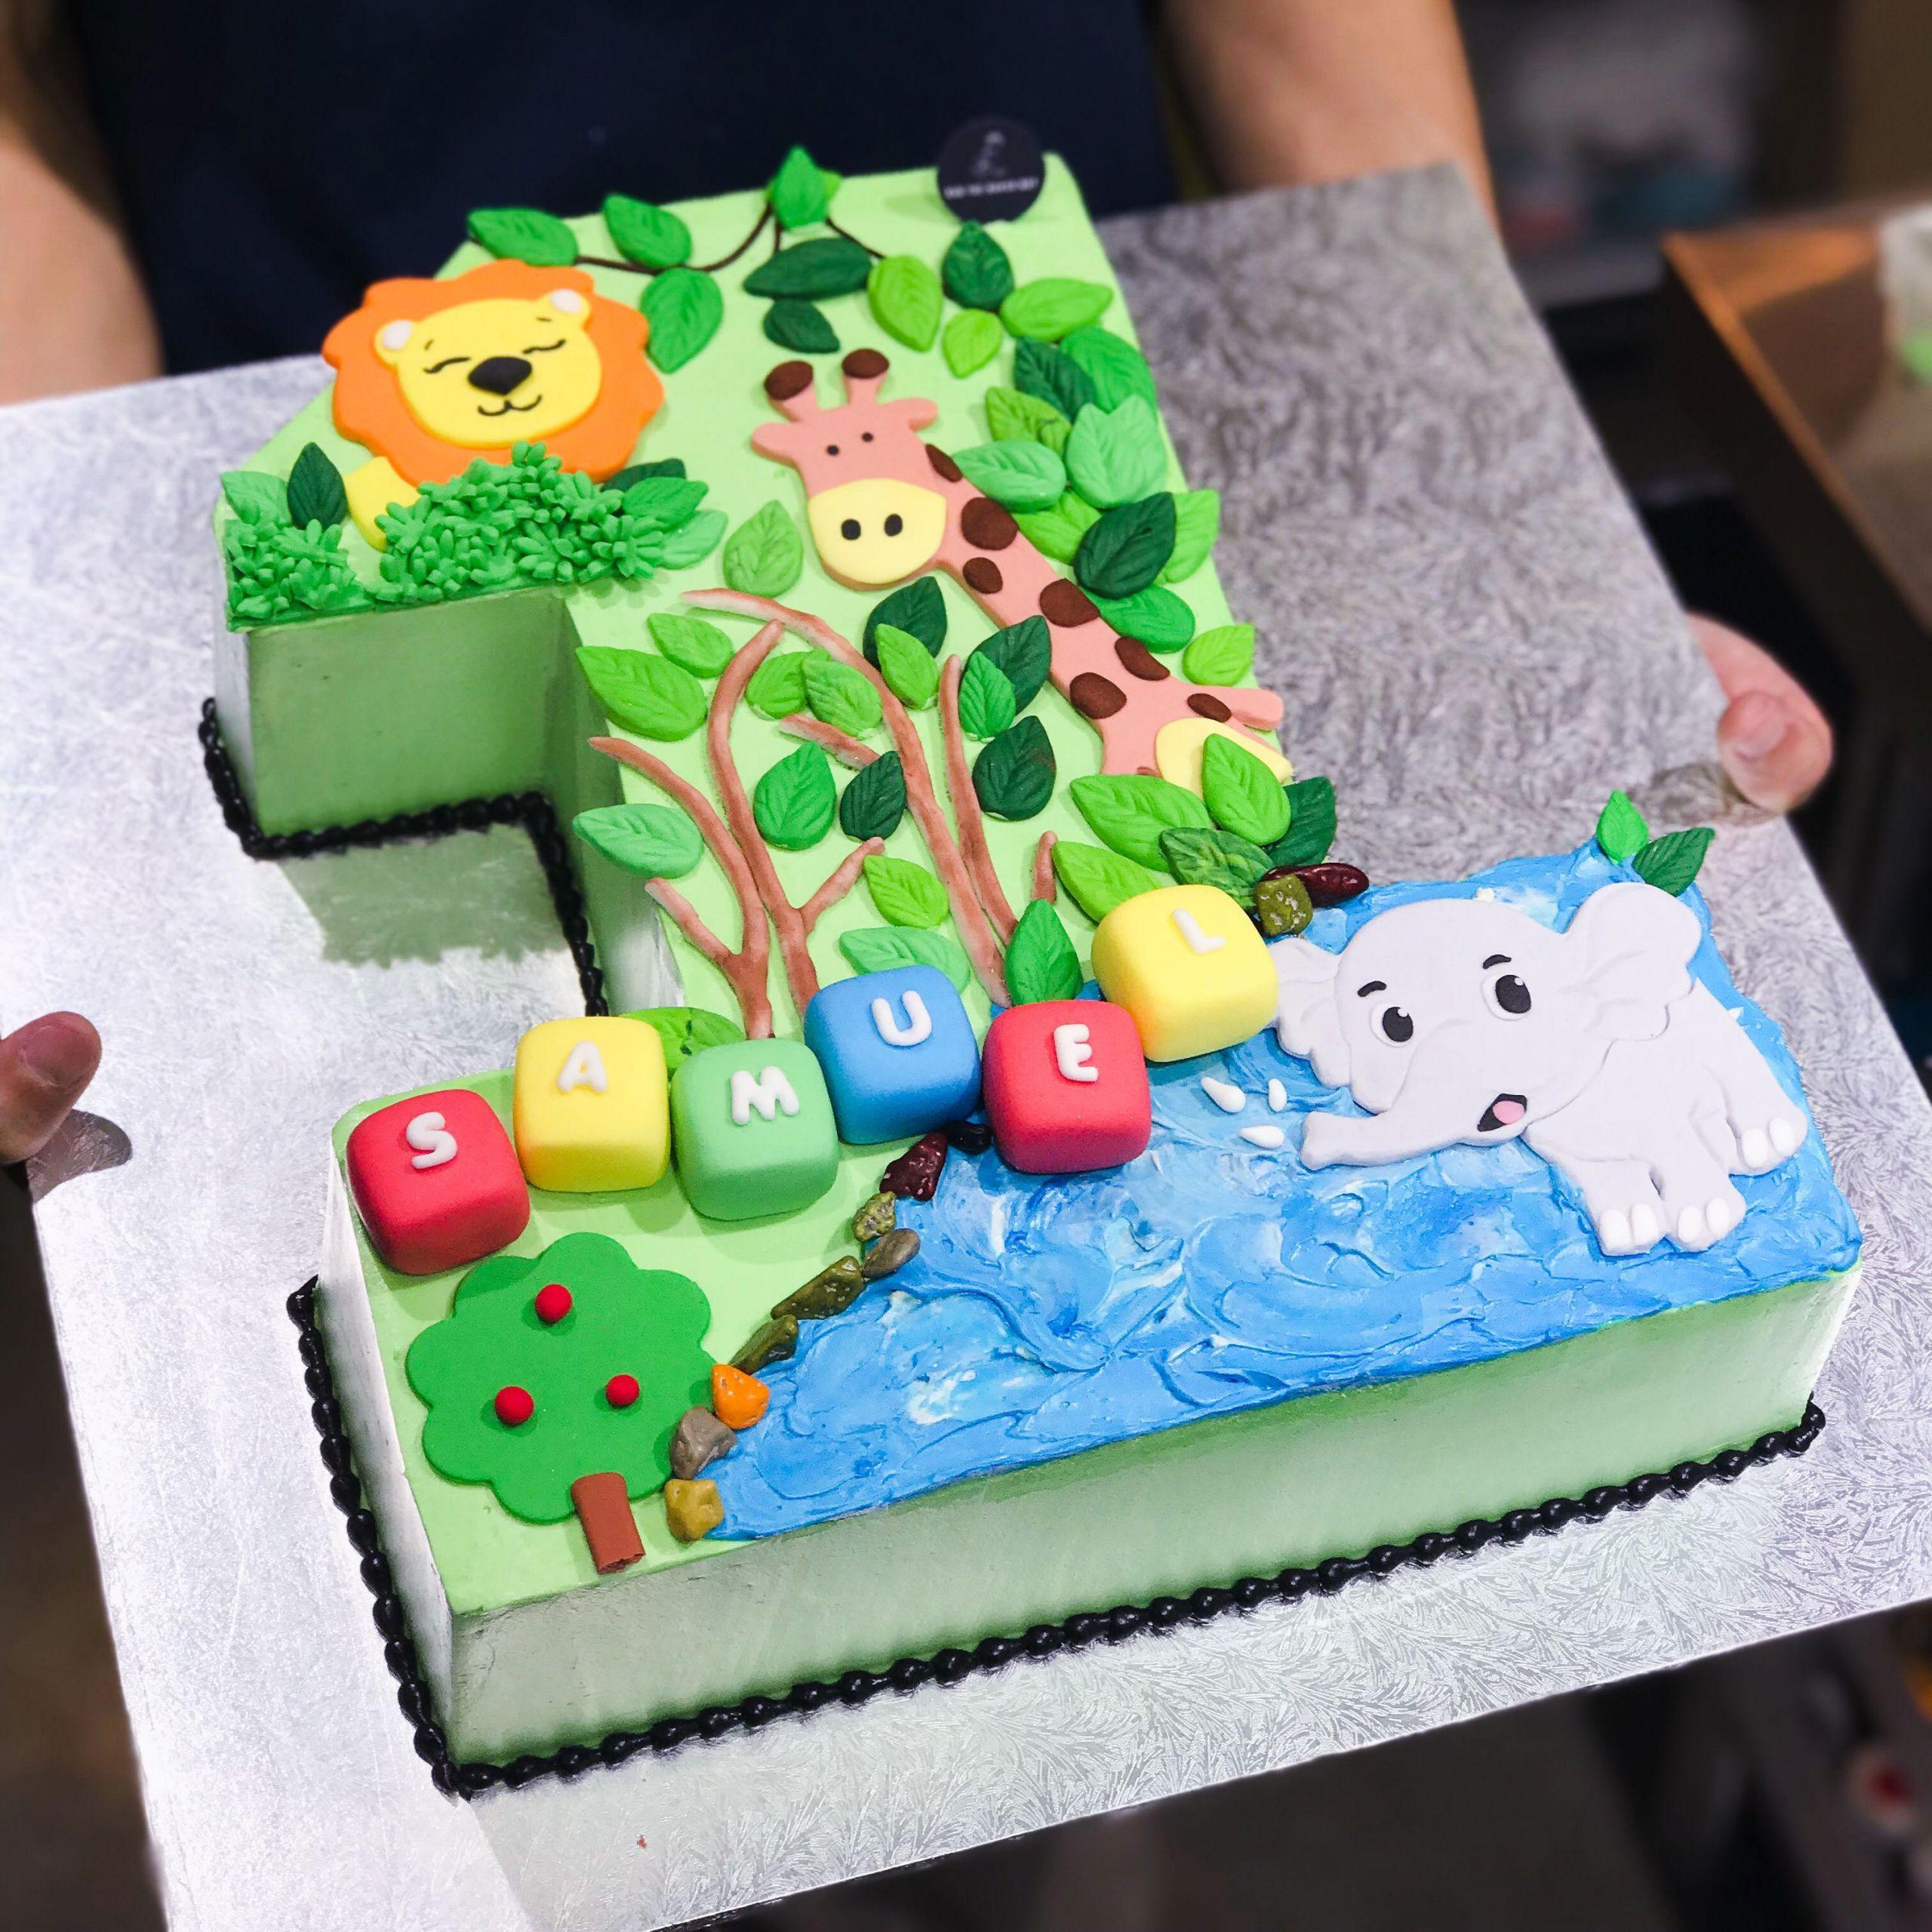 Number 1 Birthday Cake  Animal Cakes Number 1 Cakes Customised Cakes Kids